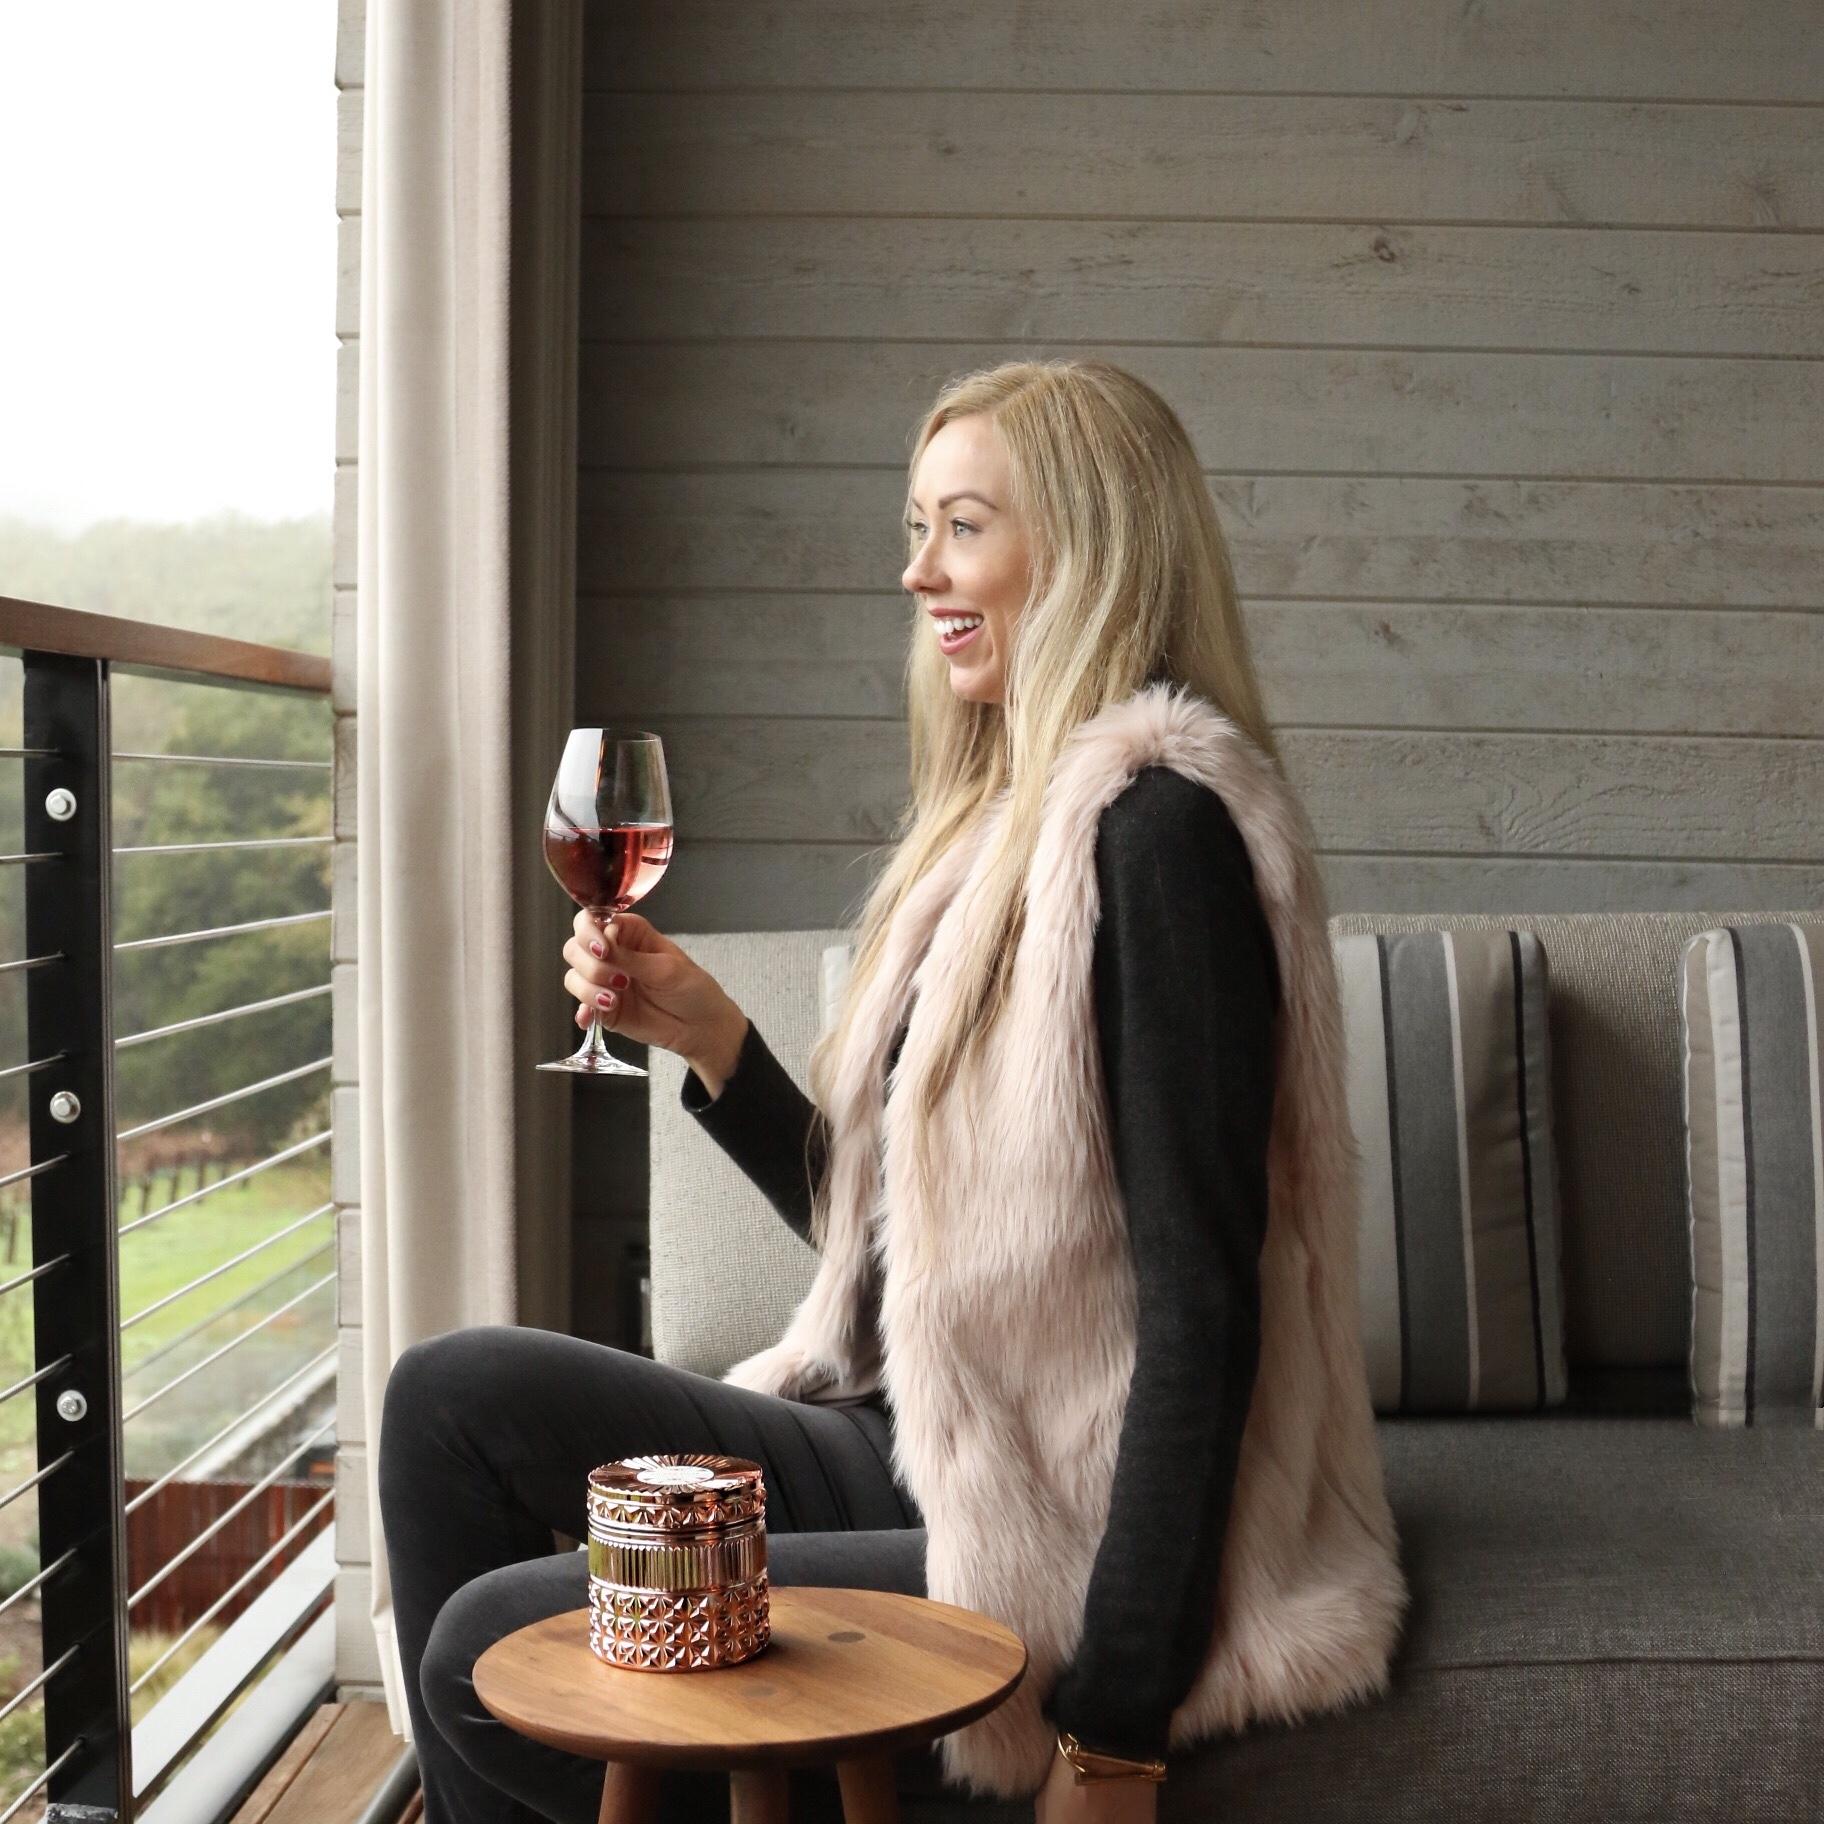 las-alcobas-hotel-napa-st-helena-patio-drinking-wine.jpg